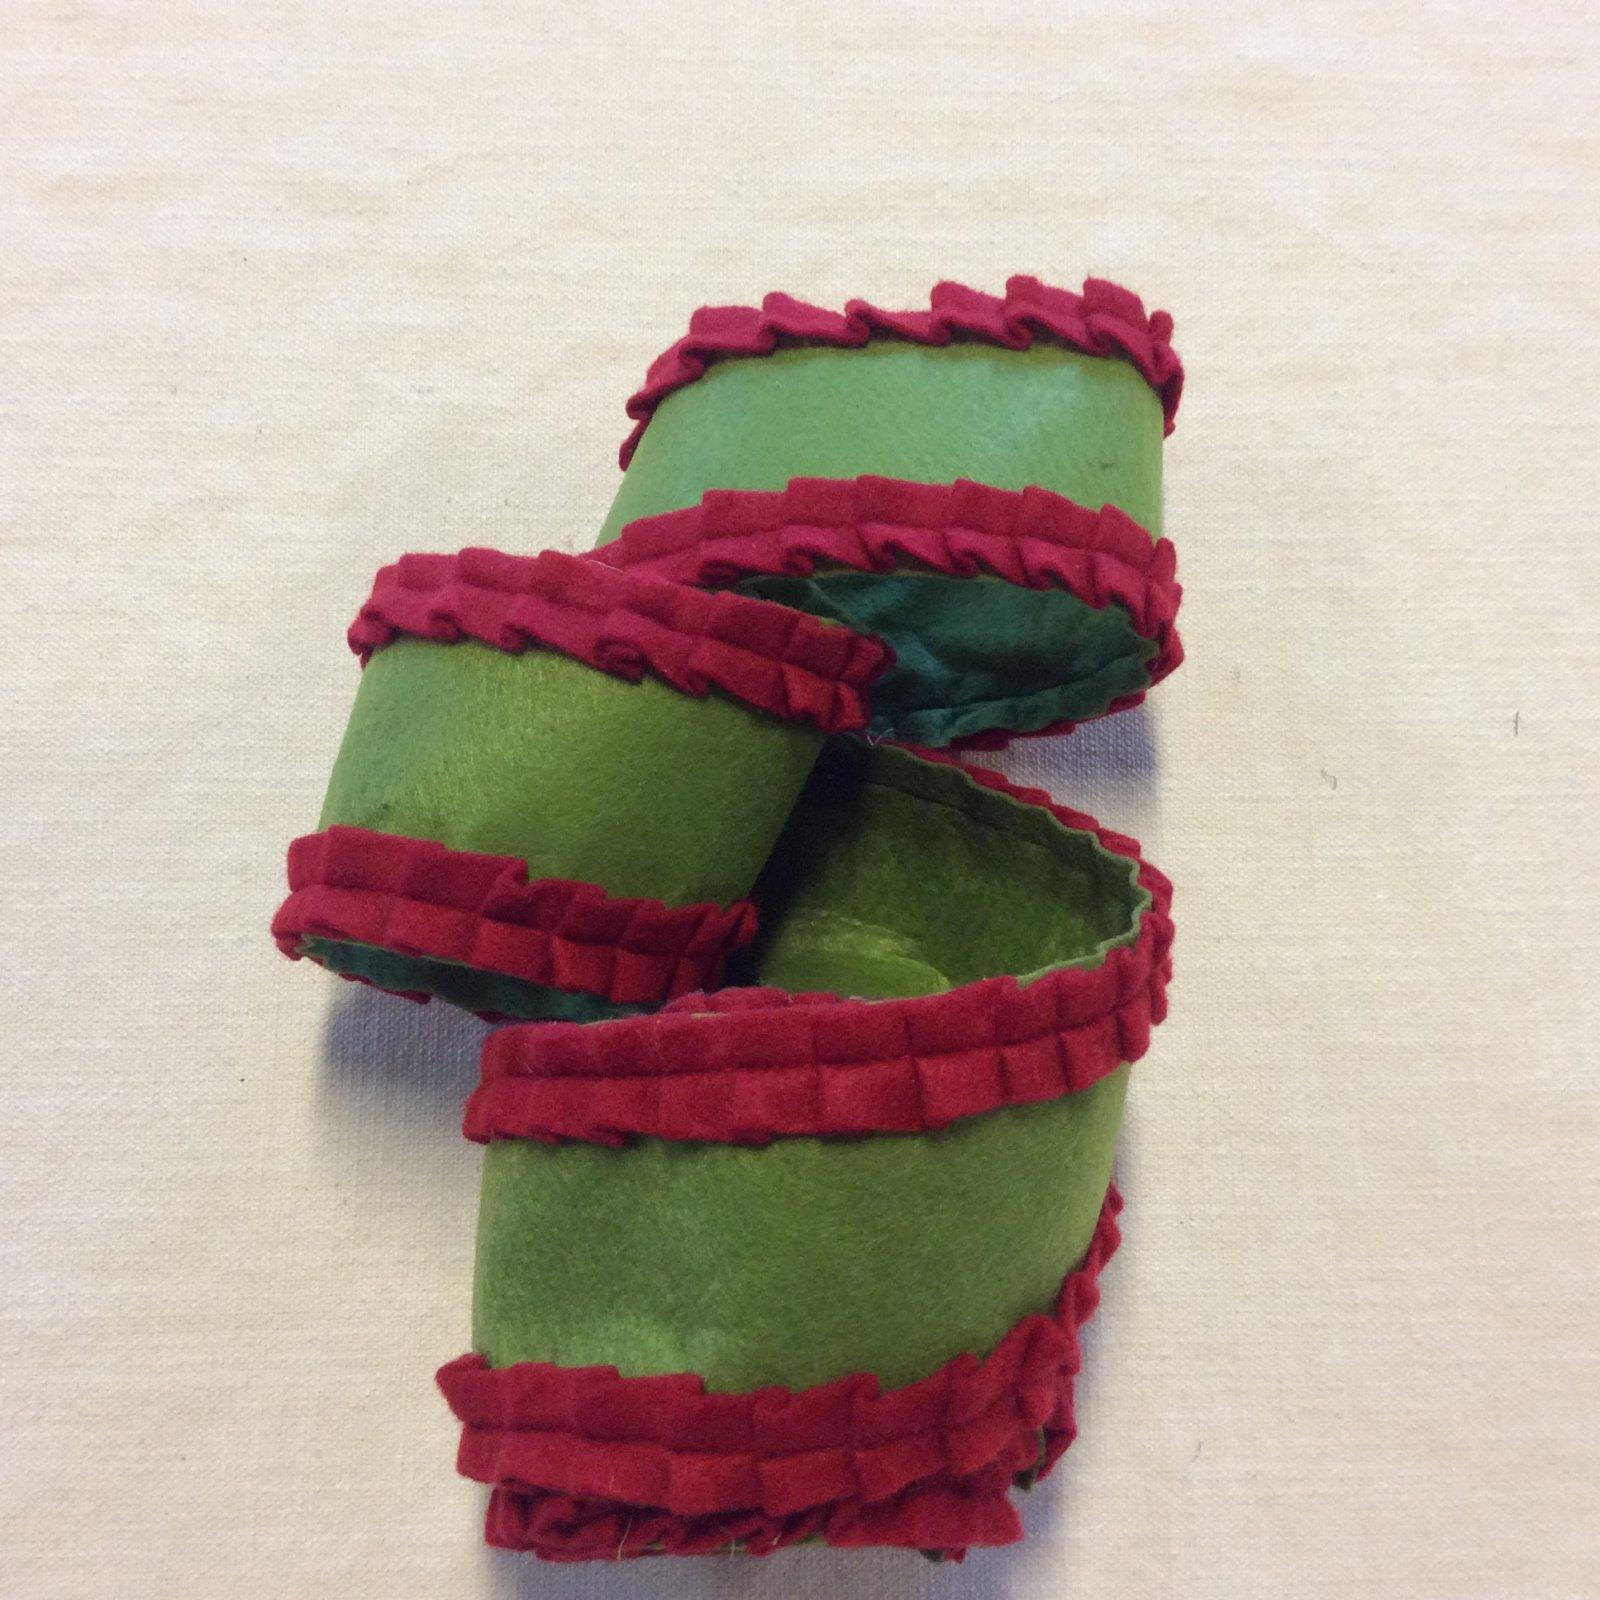 Holiday Fun Poly Felt Red and Green Ruffle Apparel Ribbon Trim RIB1455